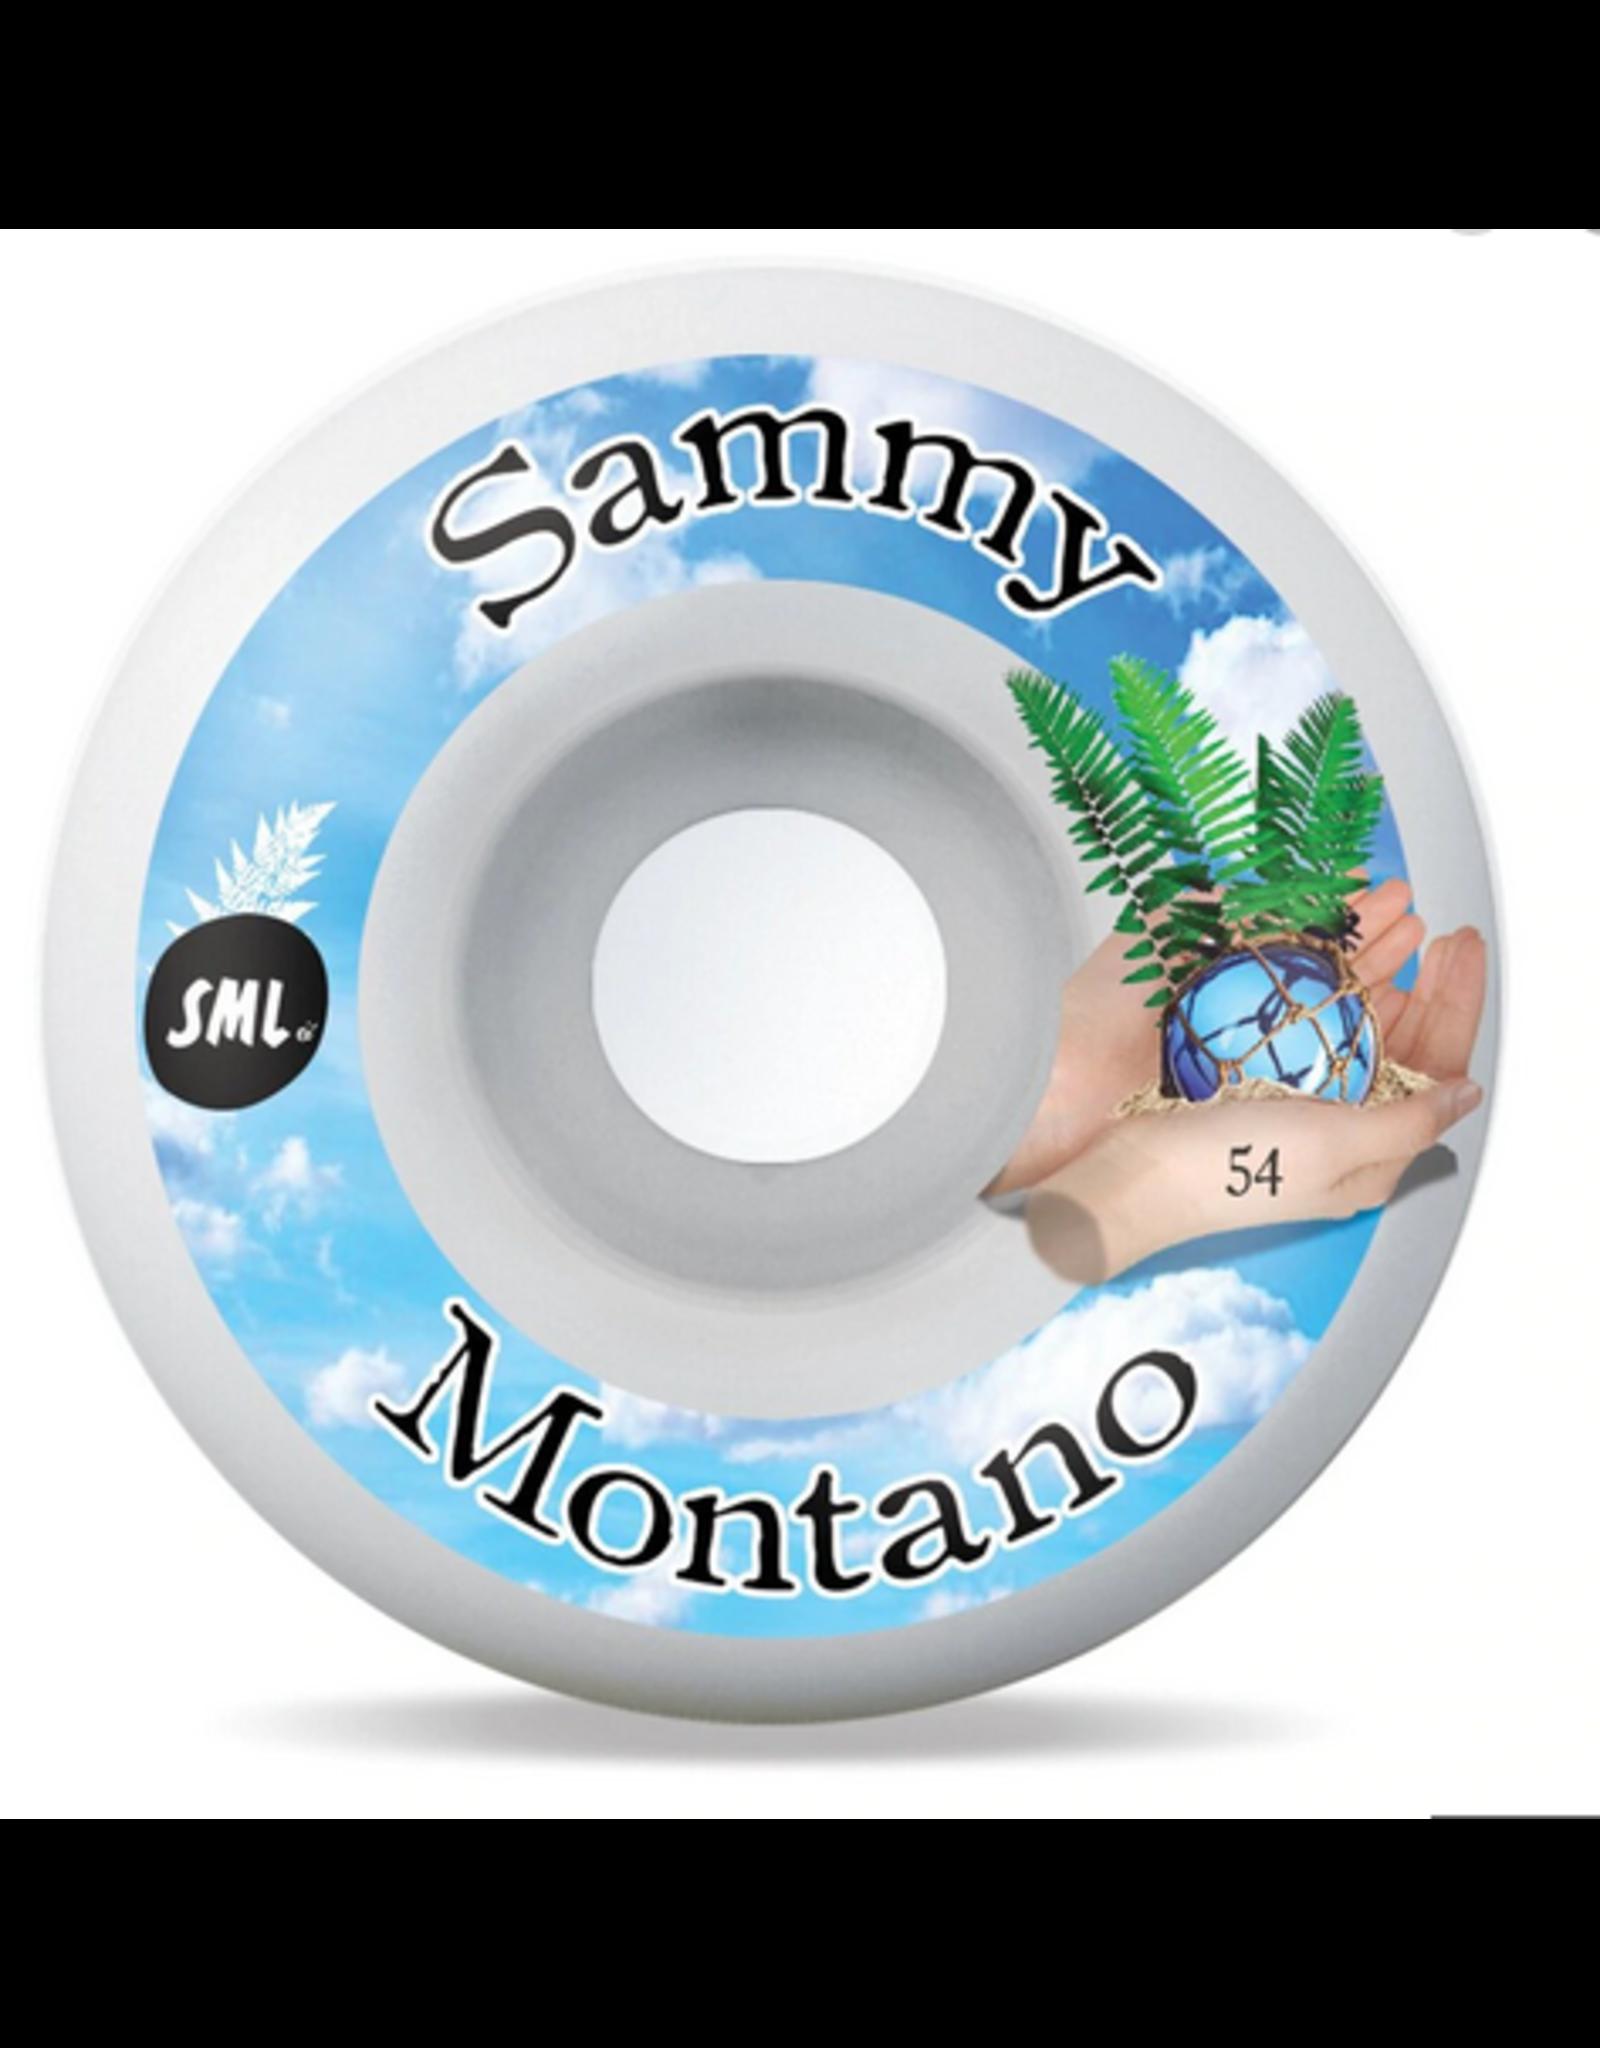 SML SML WHEELSTIDE POOL SAMMY MONTANO OG WIDE 99A 54MM